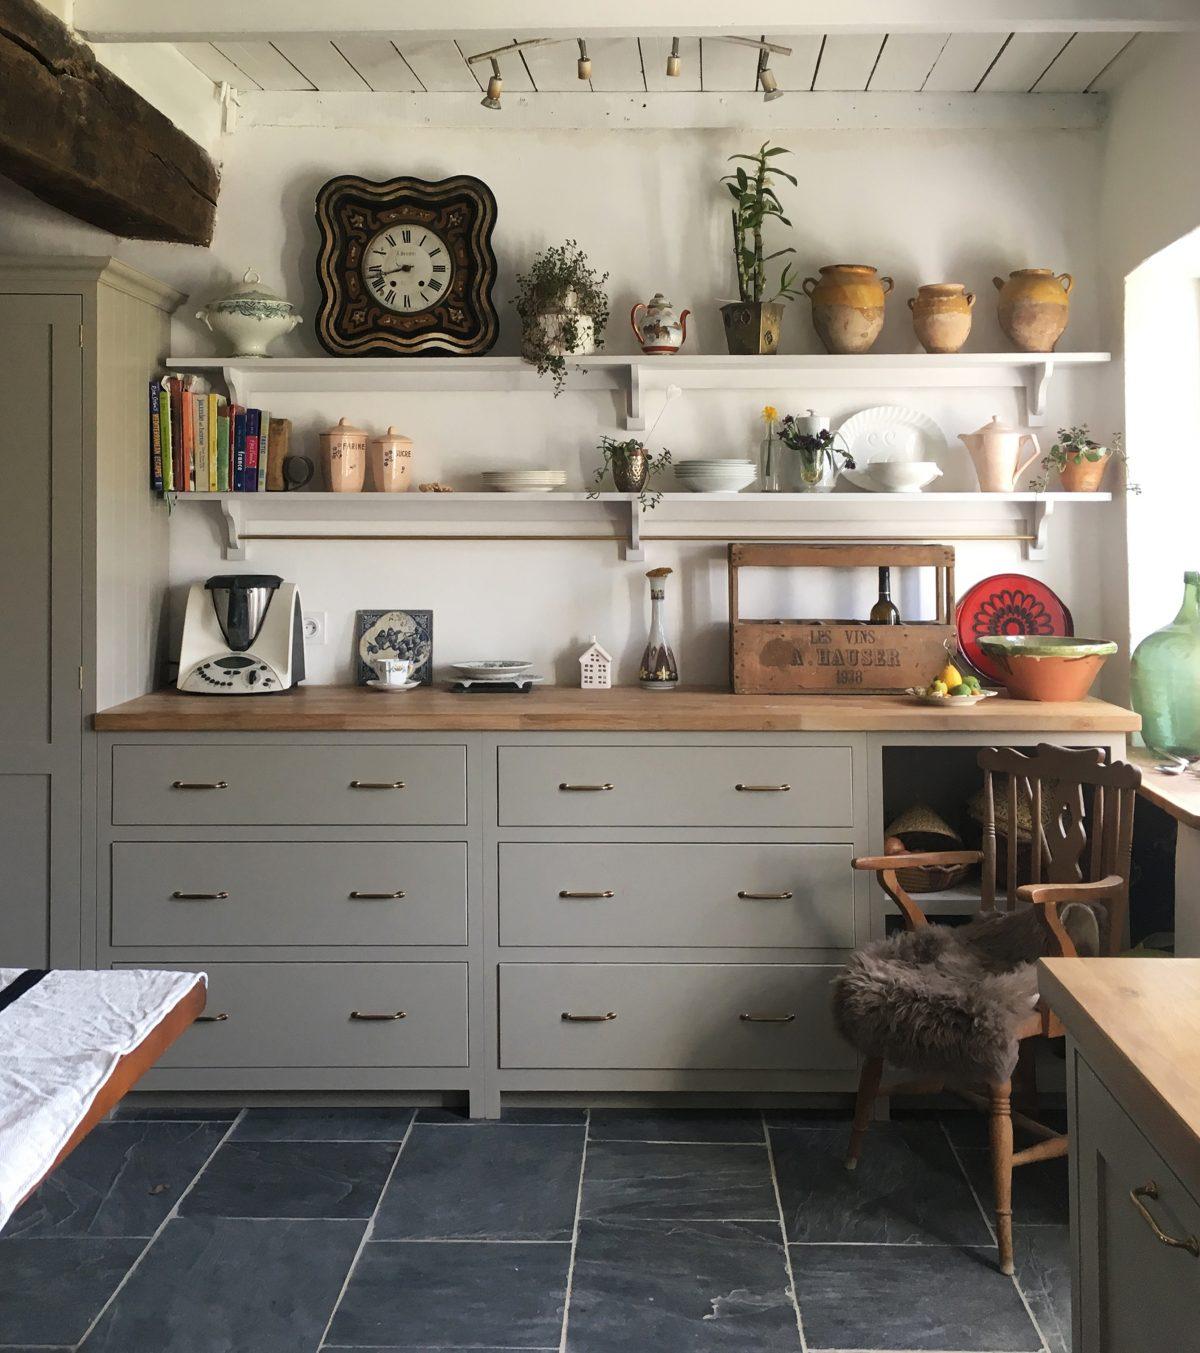 Mushroom cupboards, natural dark stone floors, wooden worktops and brass handles.